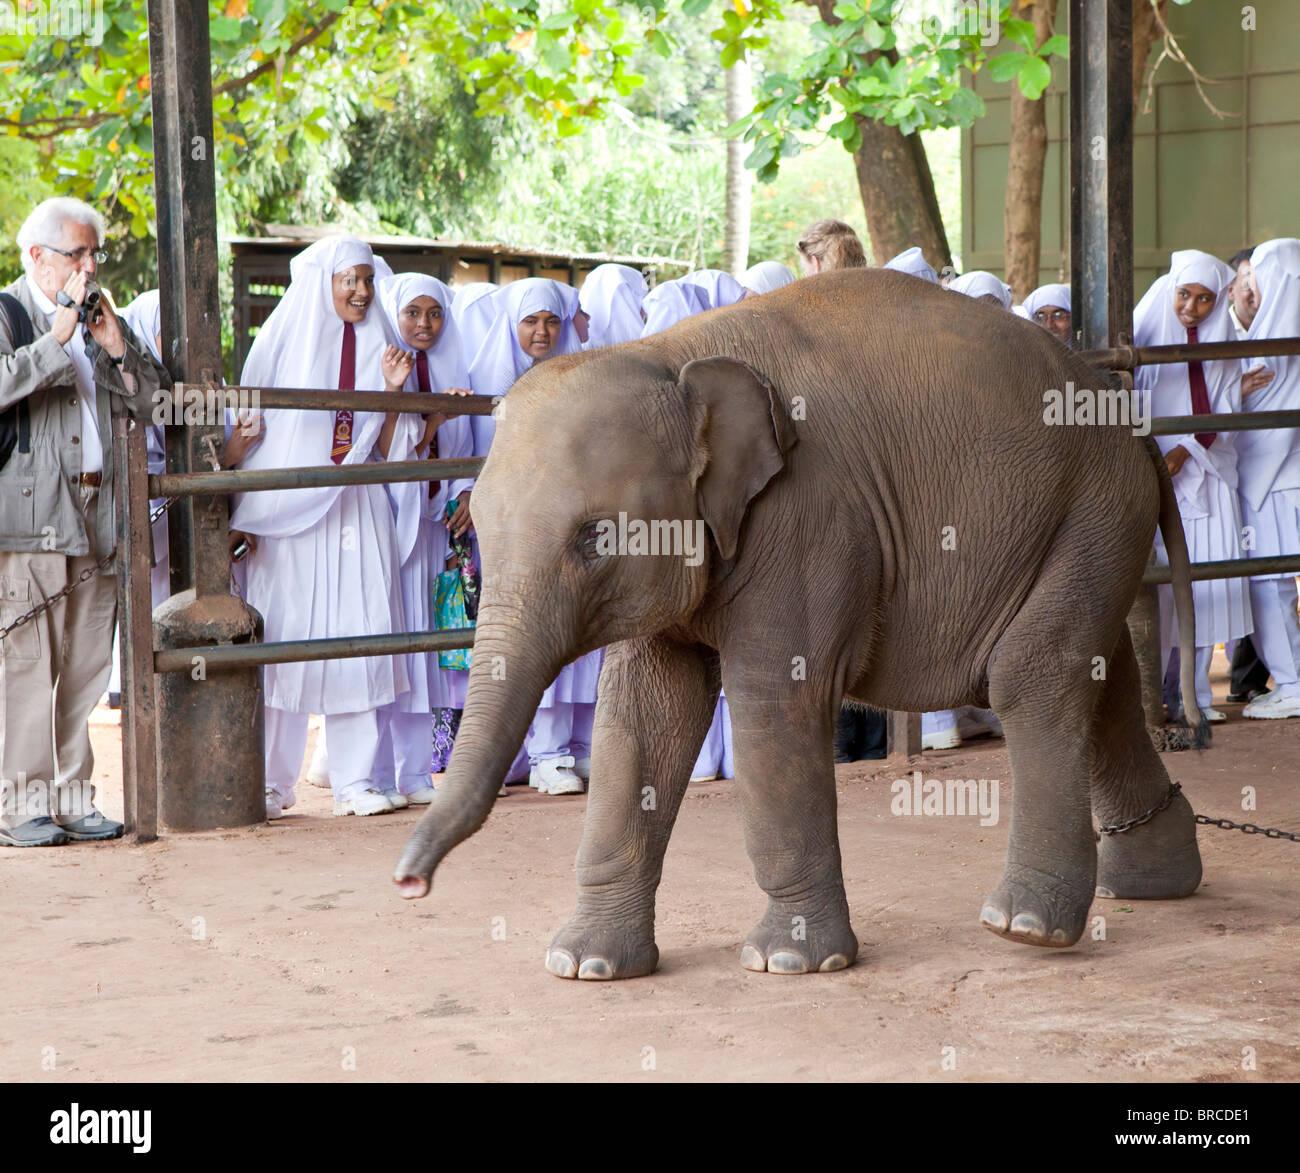 Local schoolchildren  watching elephants in The Pinnawela Elephant Orphanage - Stock Image